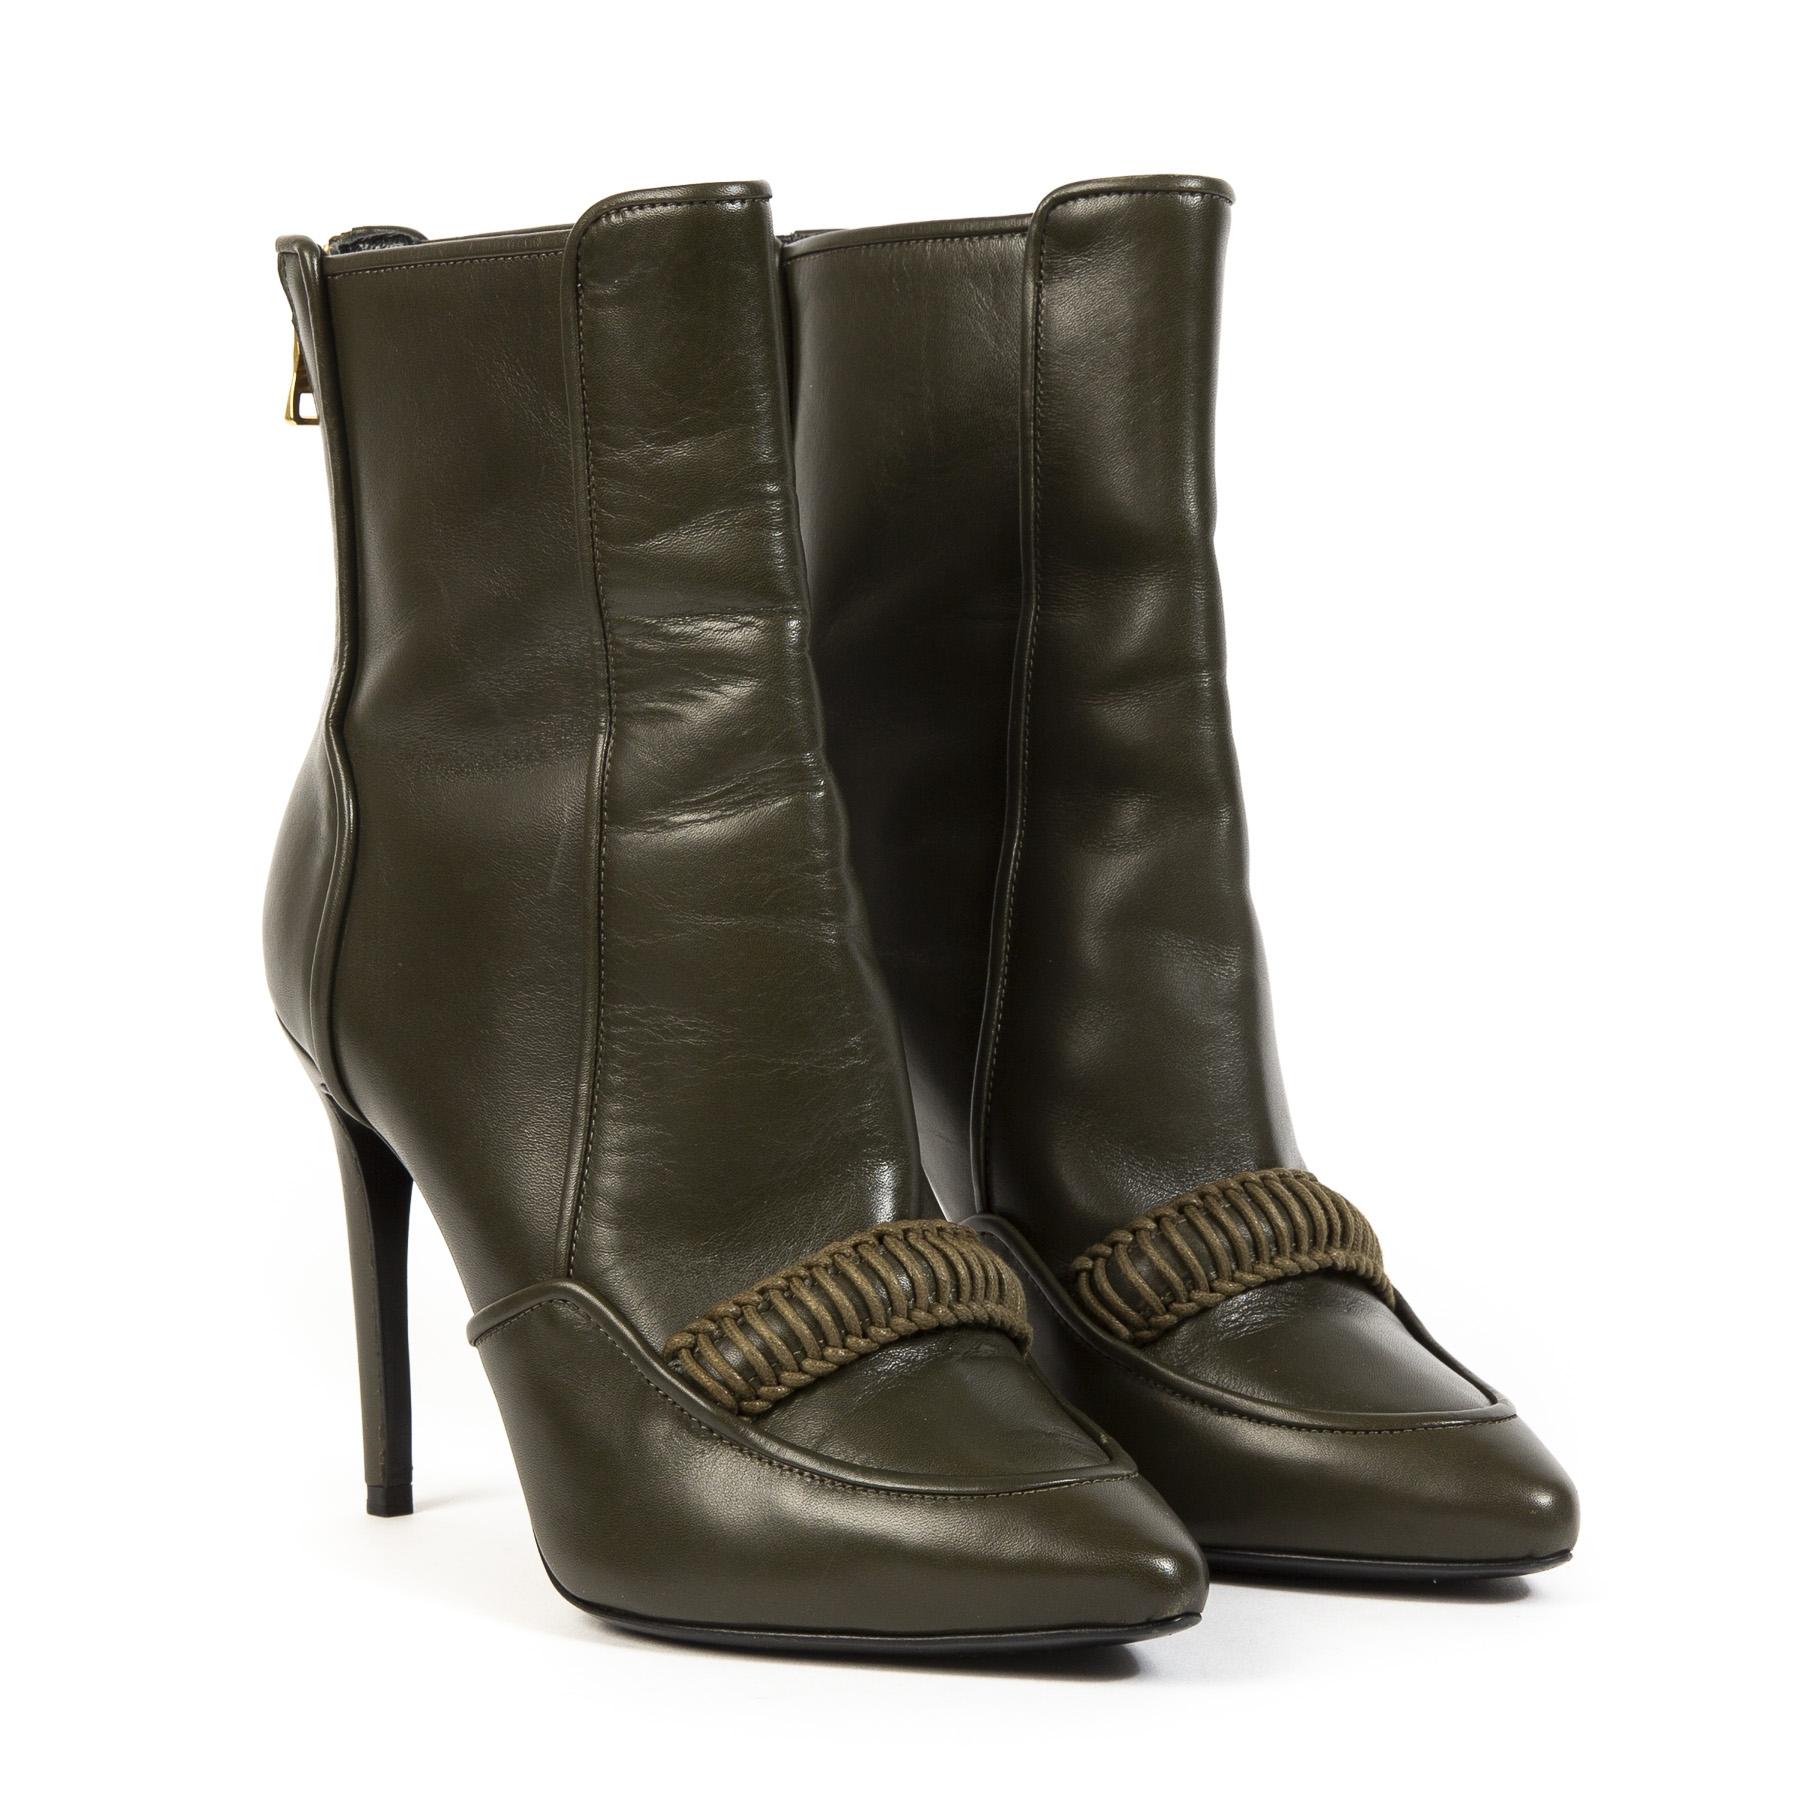 achetez balmain chaussures chez labellov